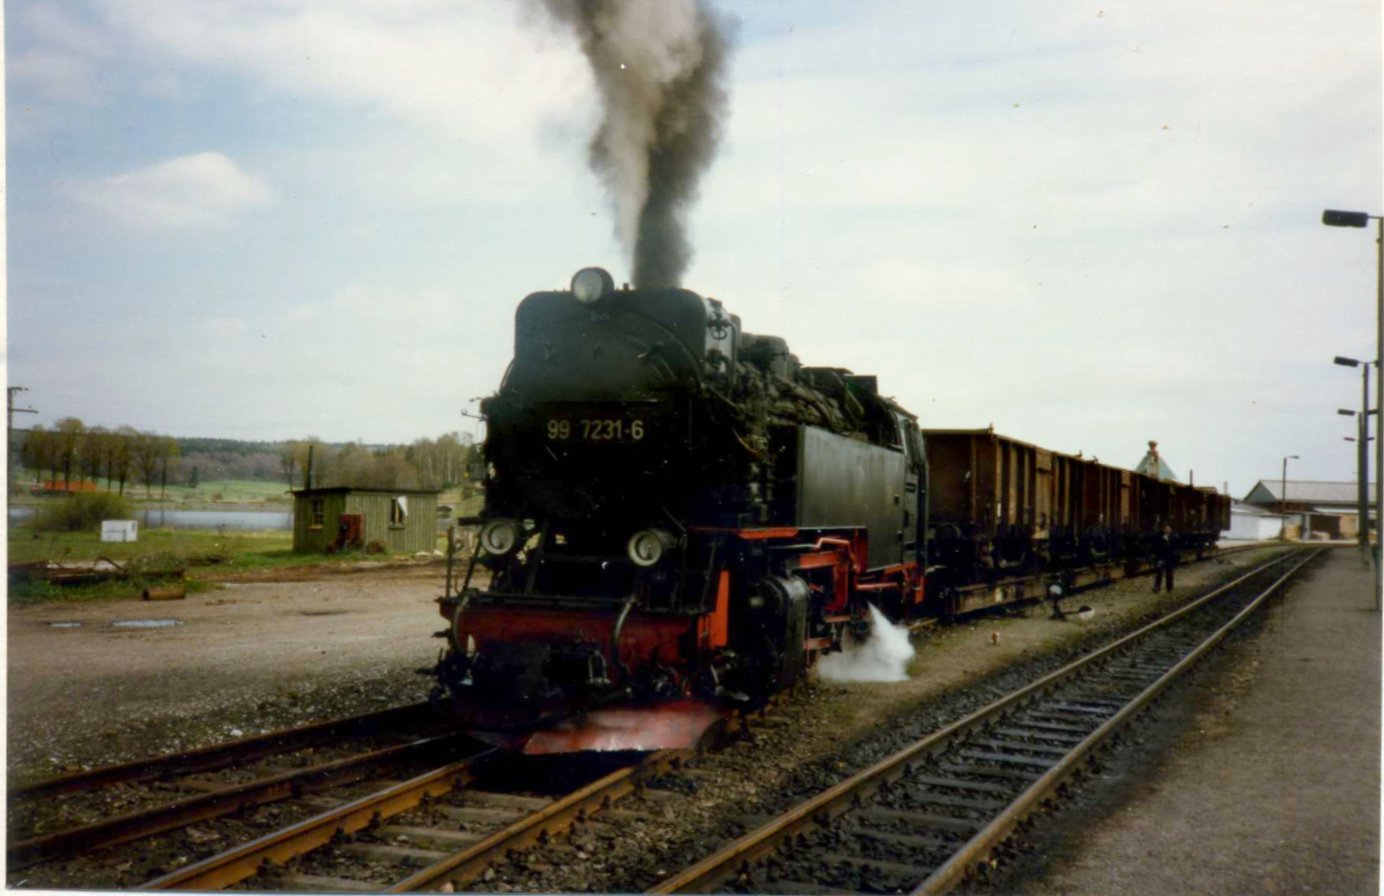 El juego de las imagenes-https://upload.wikimedia.org/wikipedia/commons/0/0f/DR_99_7231-6_Bahnhof_Stiege.jpg